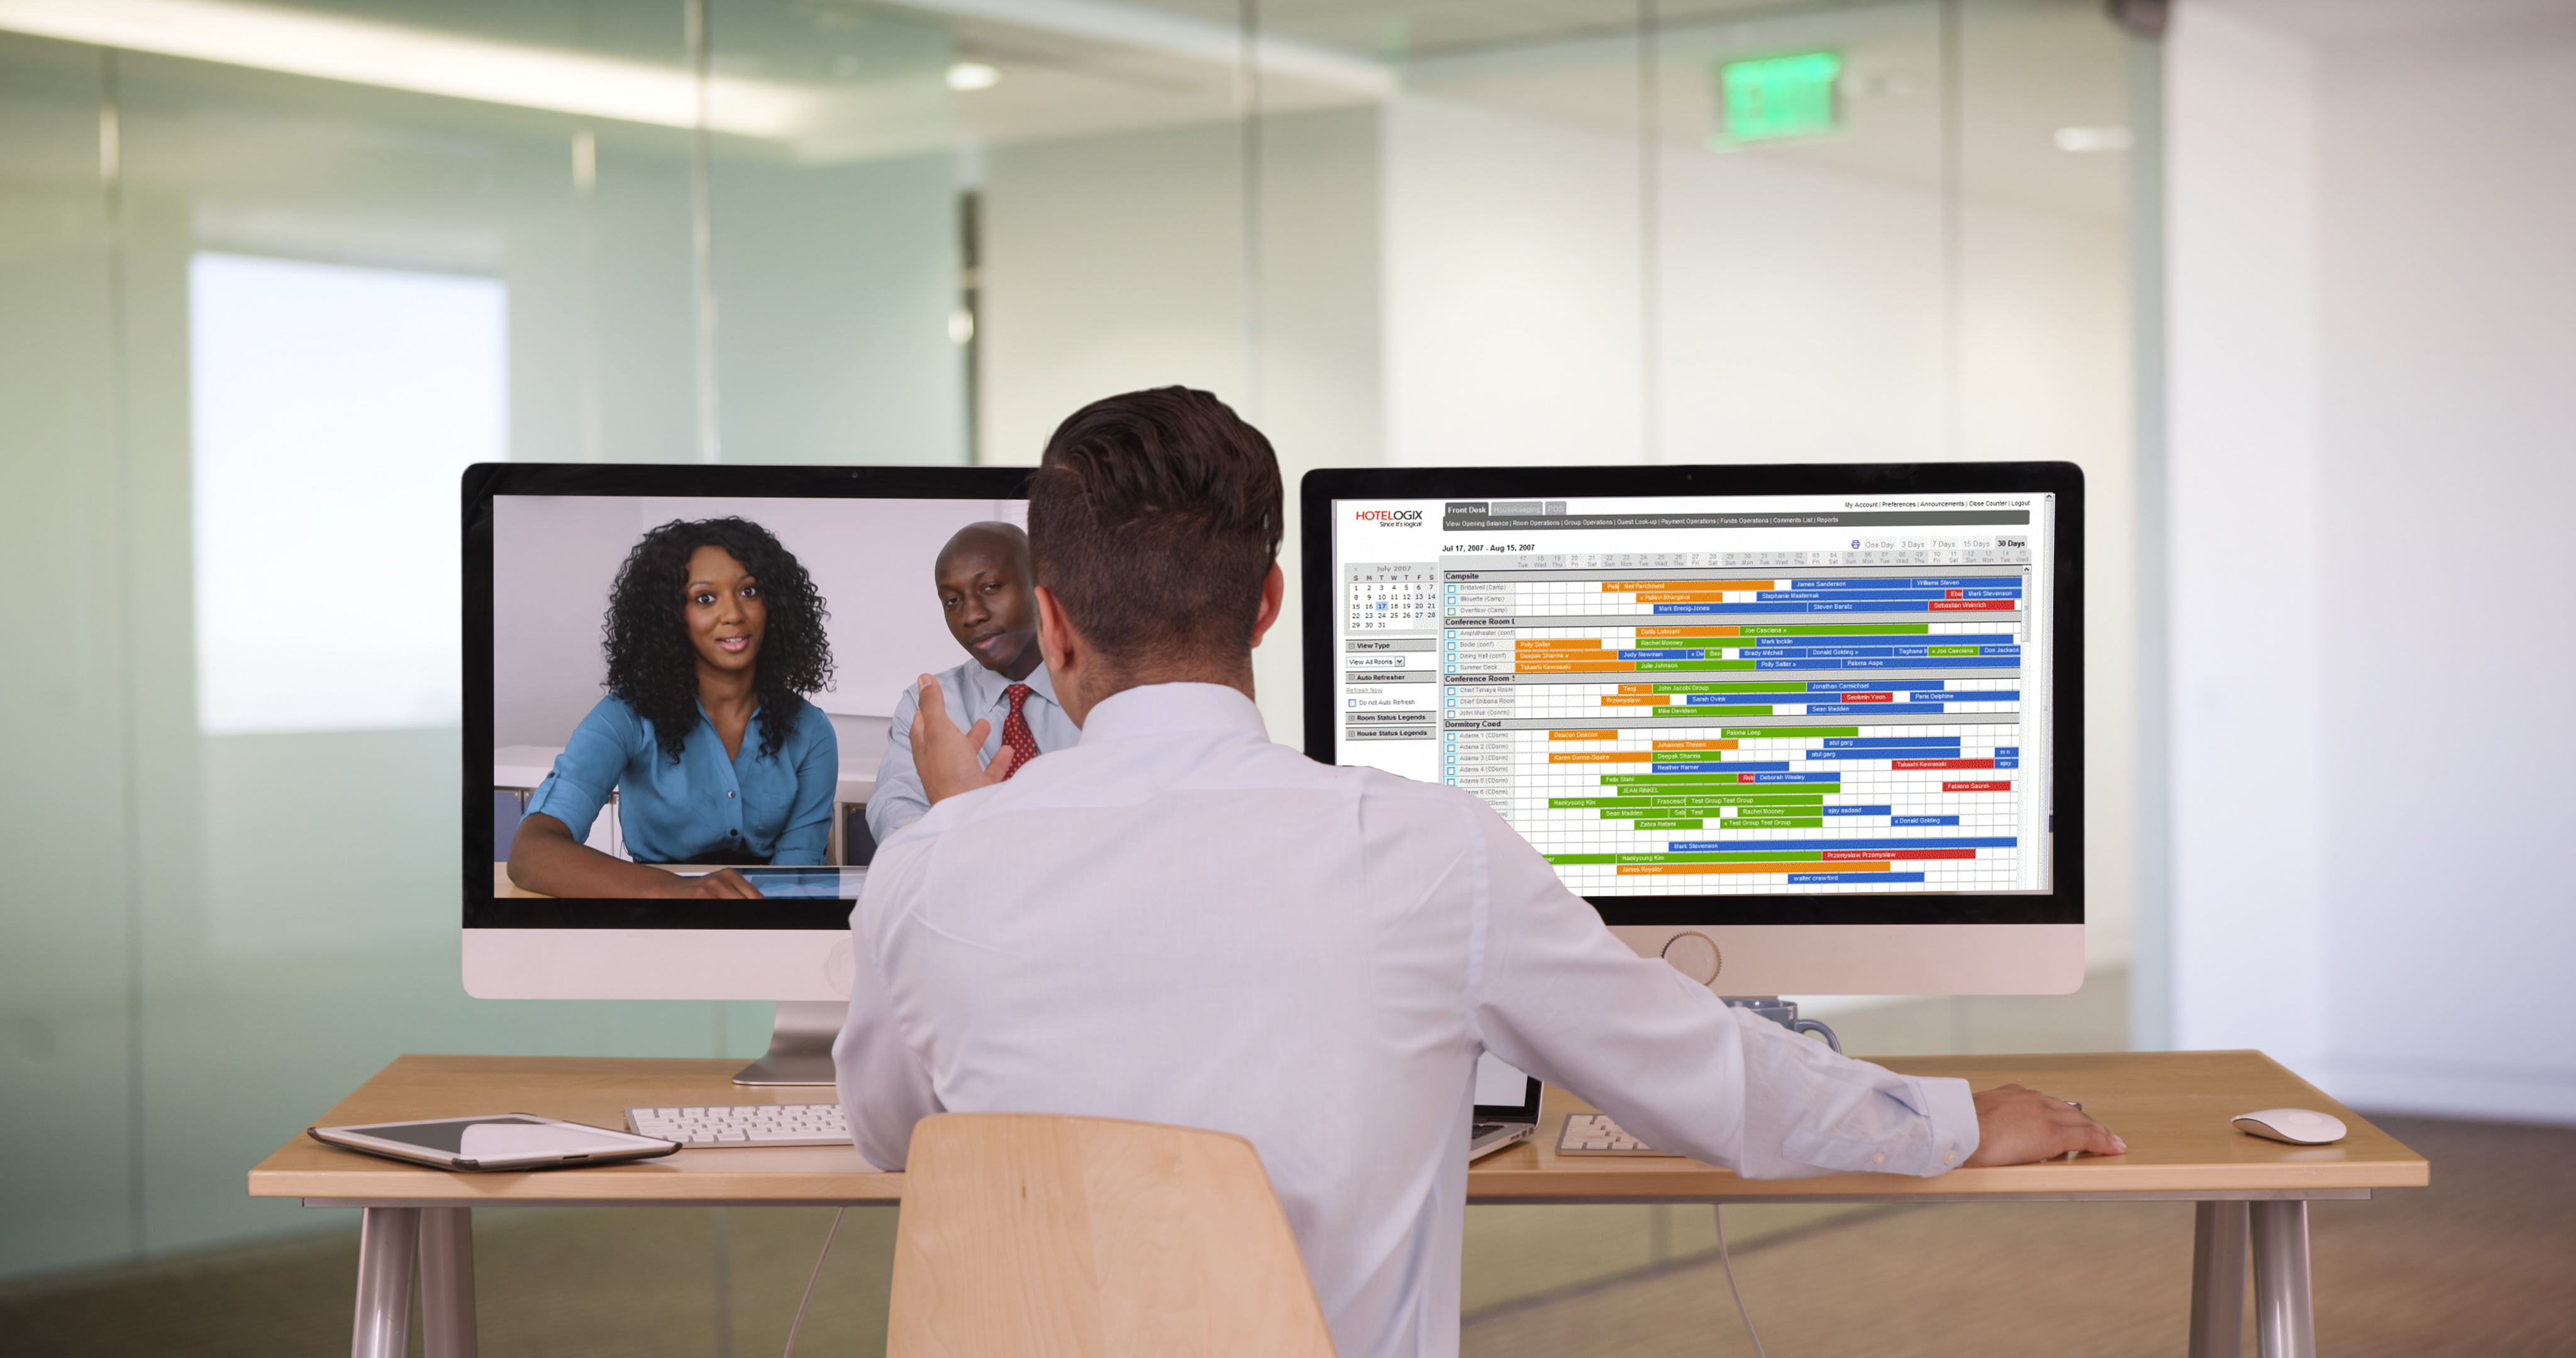 Agent providing customer service remotely using Virtual Front Desk